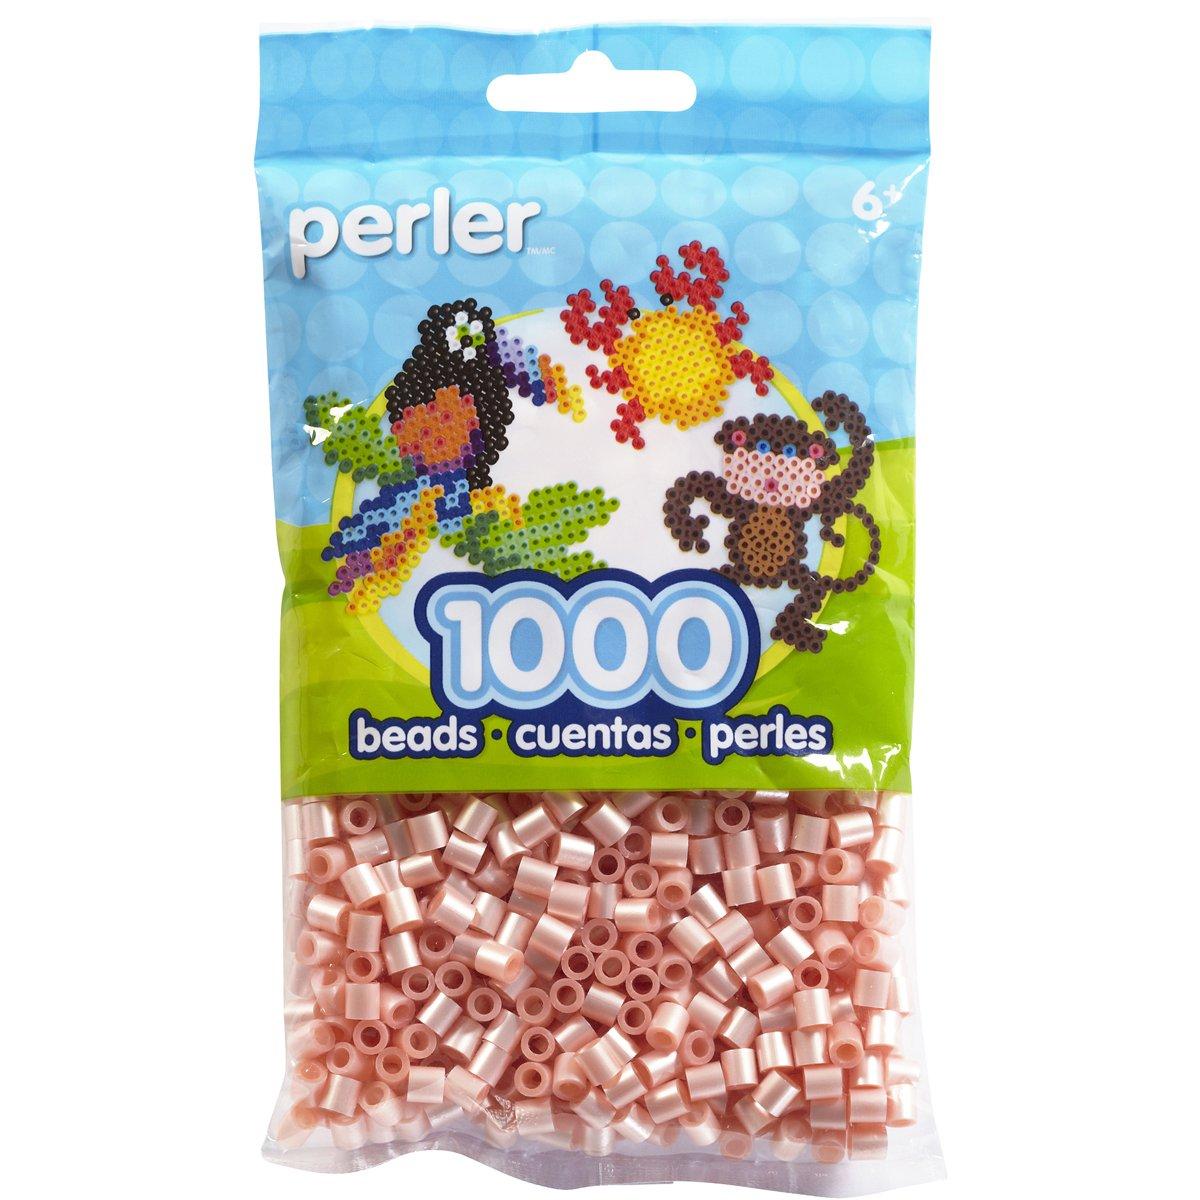 Perler Beads Bag, Pearl Light Pink, 1000Count 80-15104